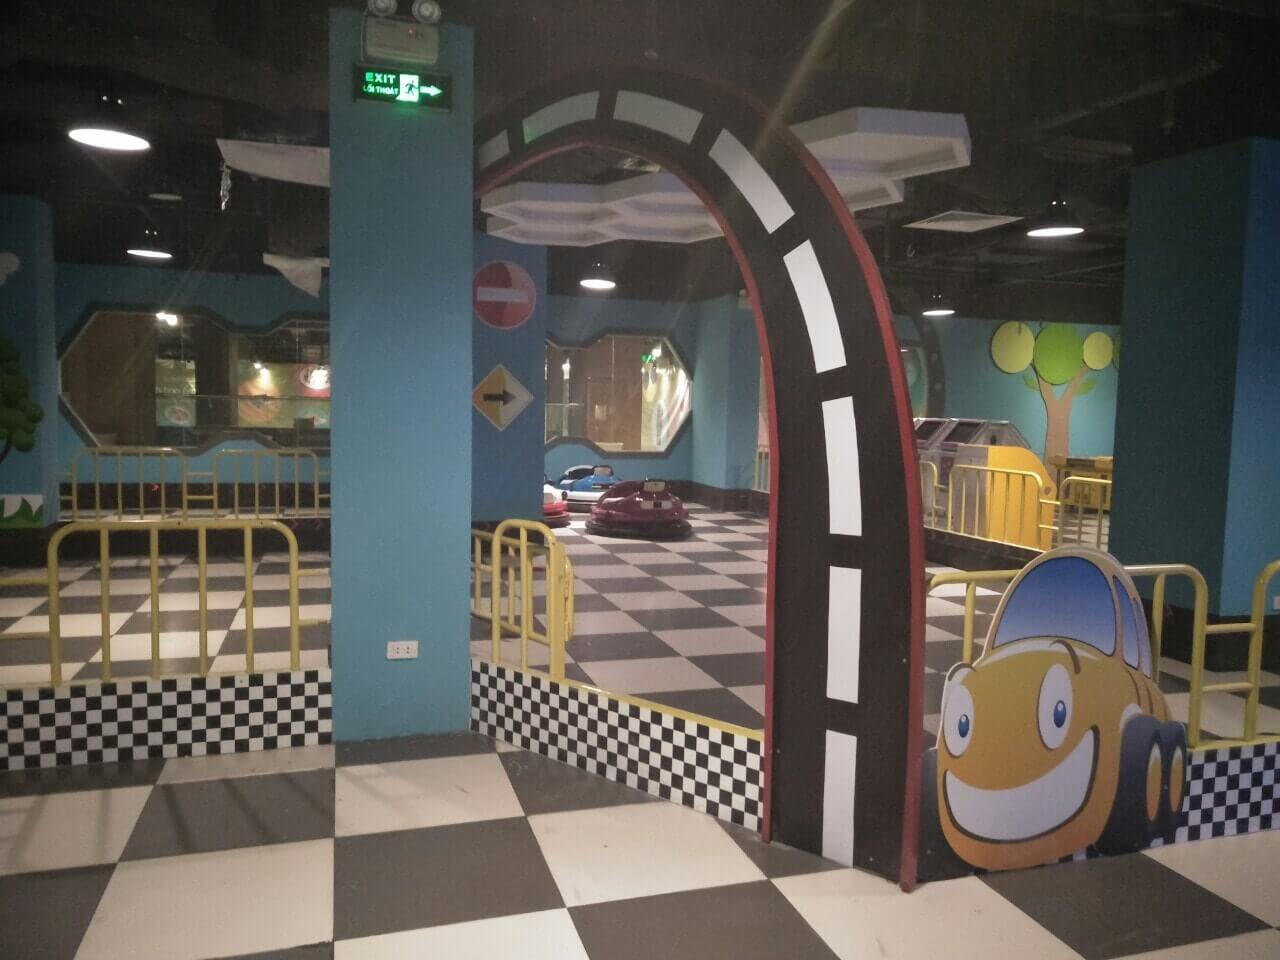 GOADESIGN Thiết Kế Khu Vui Chơi Garden Mall - Q5 (13)